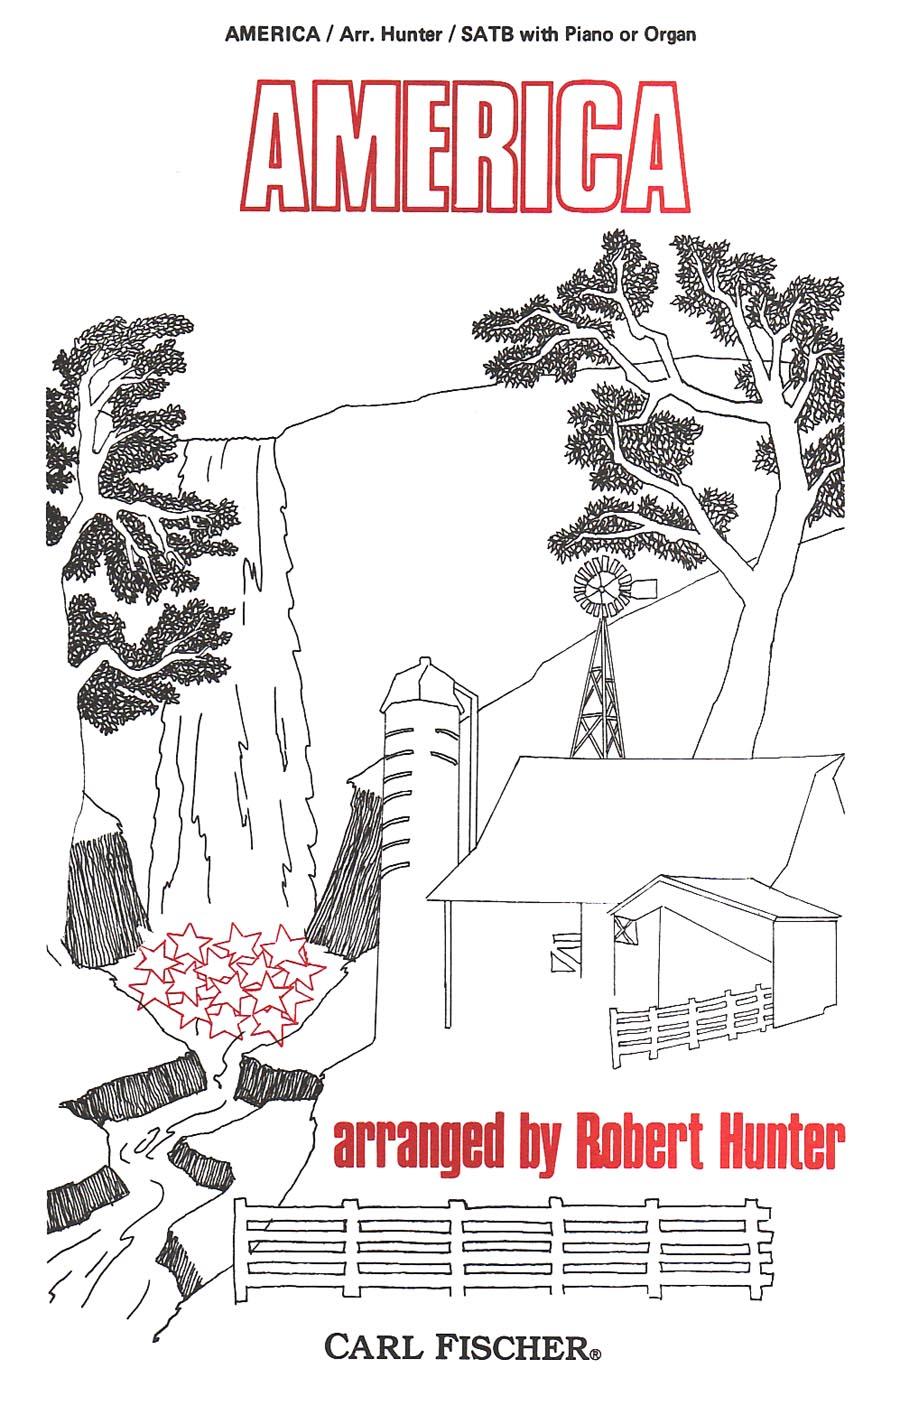 America | arr. Robert Hunter